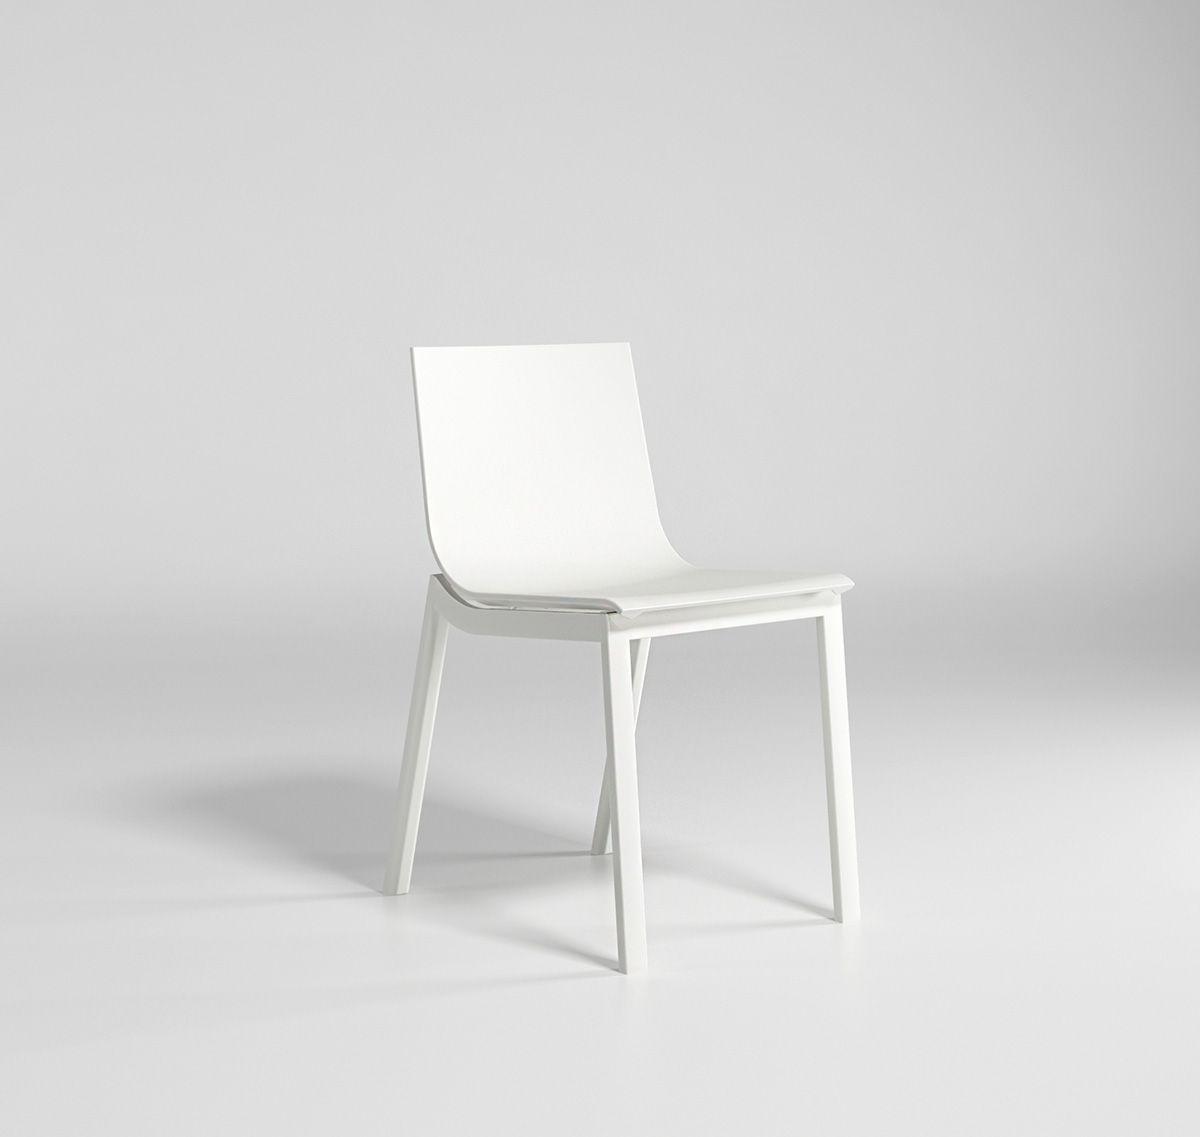 05-stack-system-chair-borja-garcia-gandiablasco